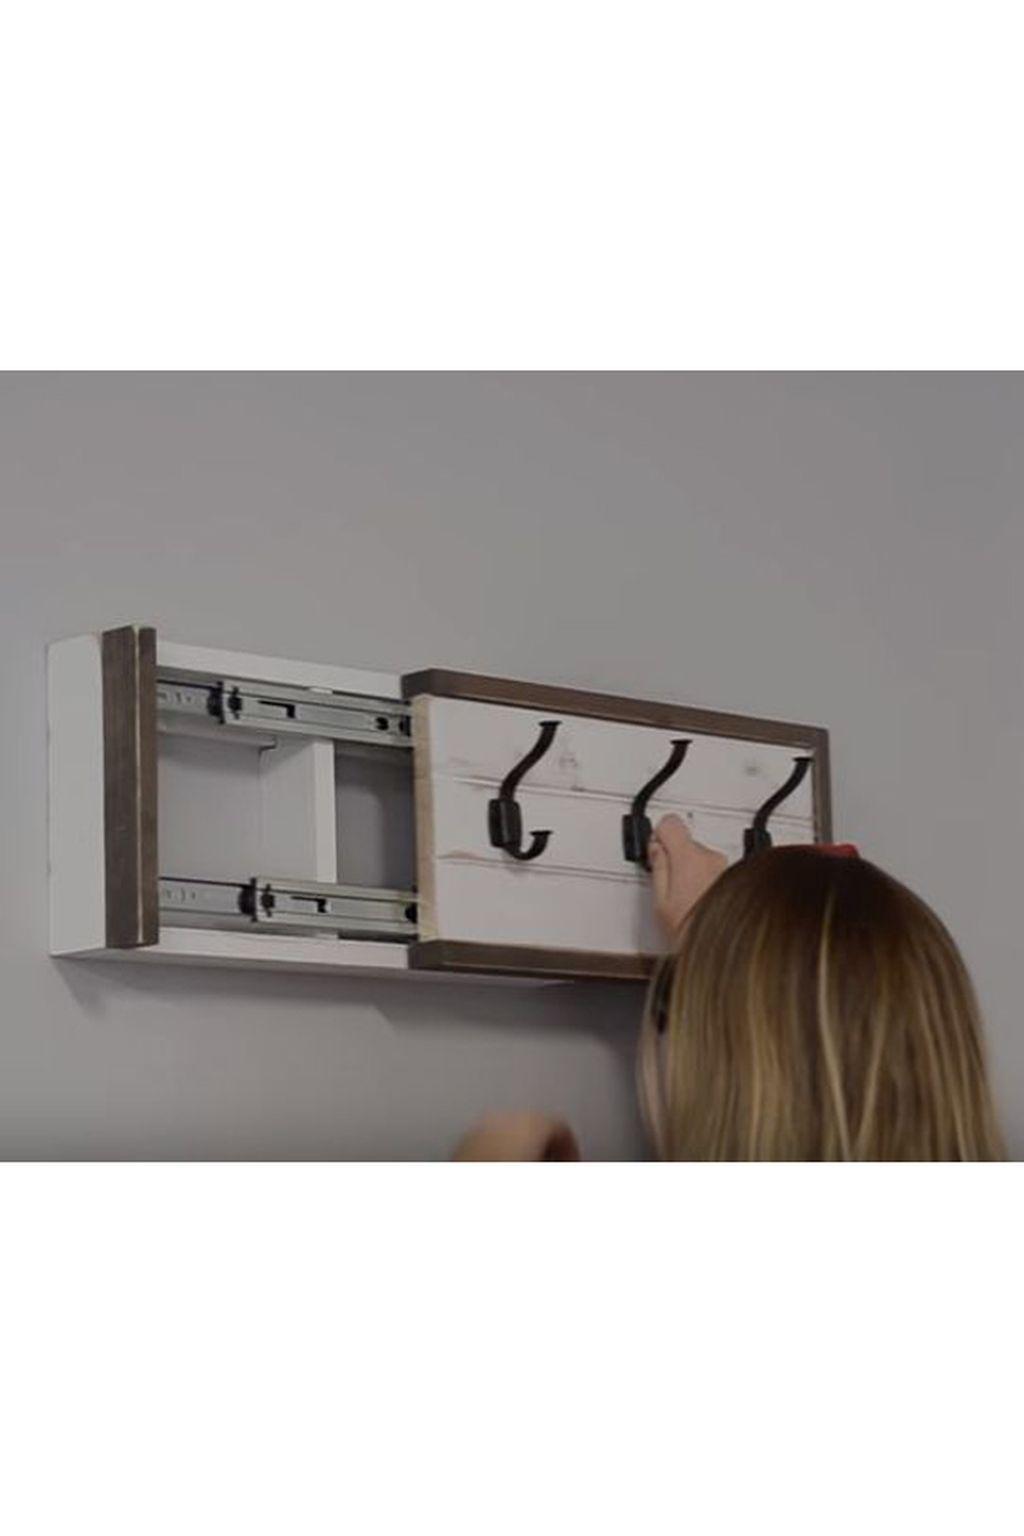 Fantastic Secret Storage Design Ideas That Everyone Won'T Know It 23